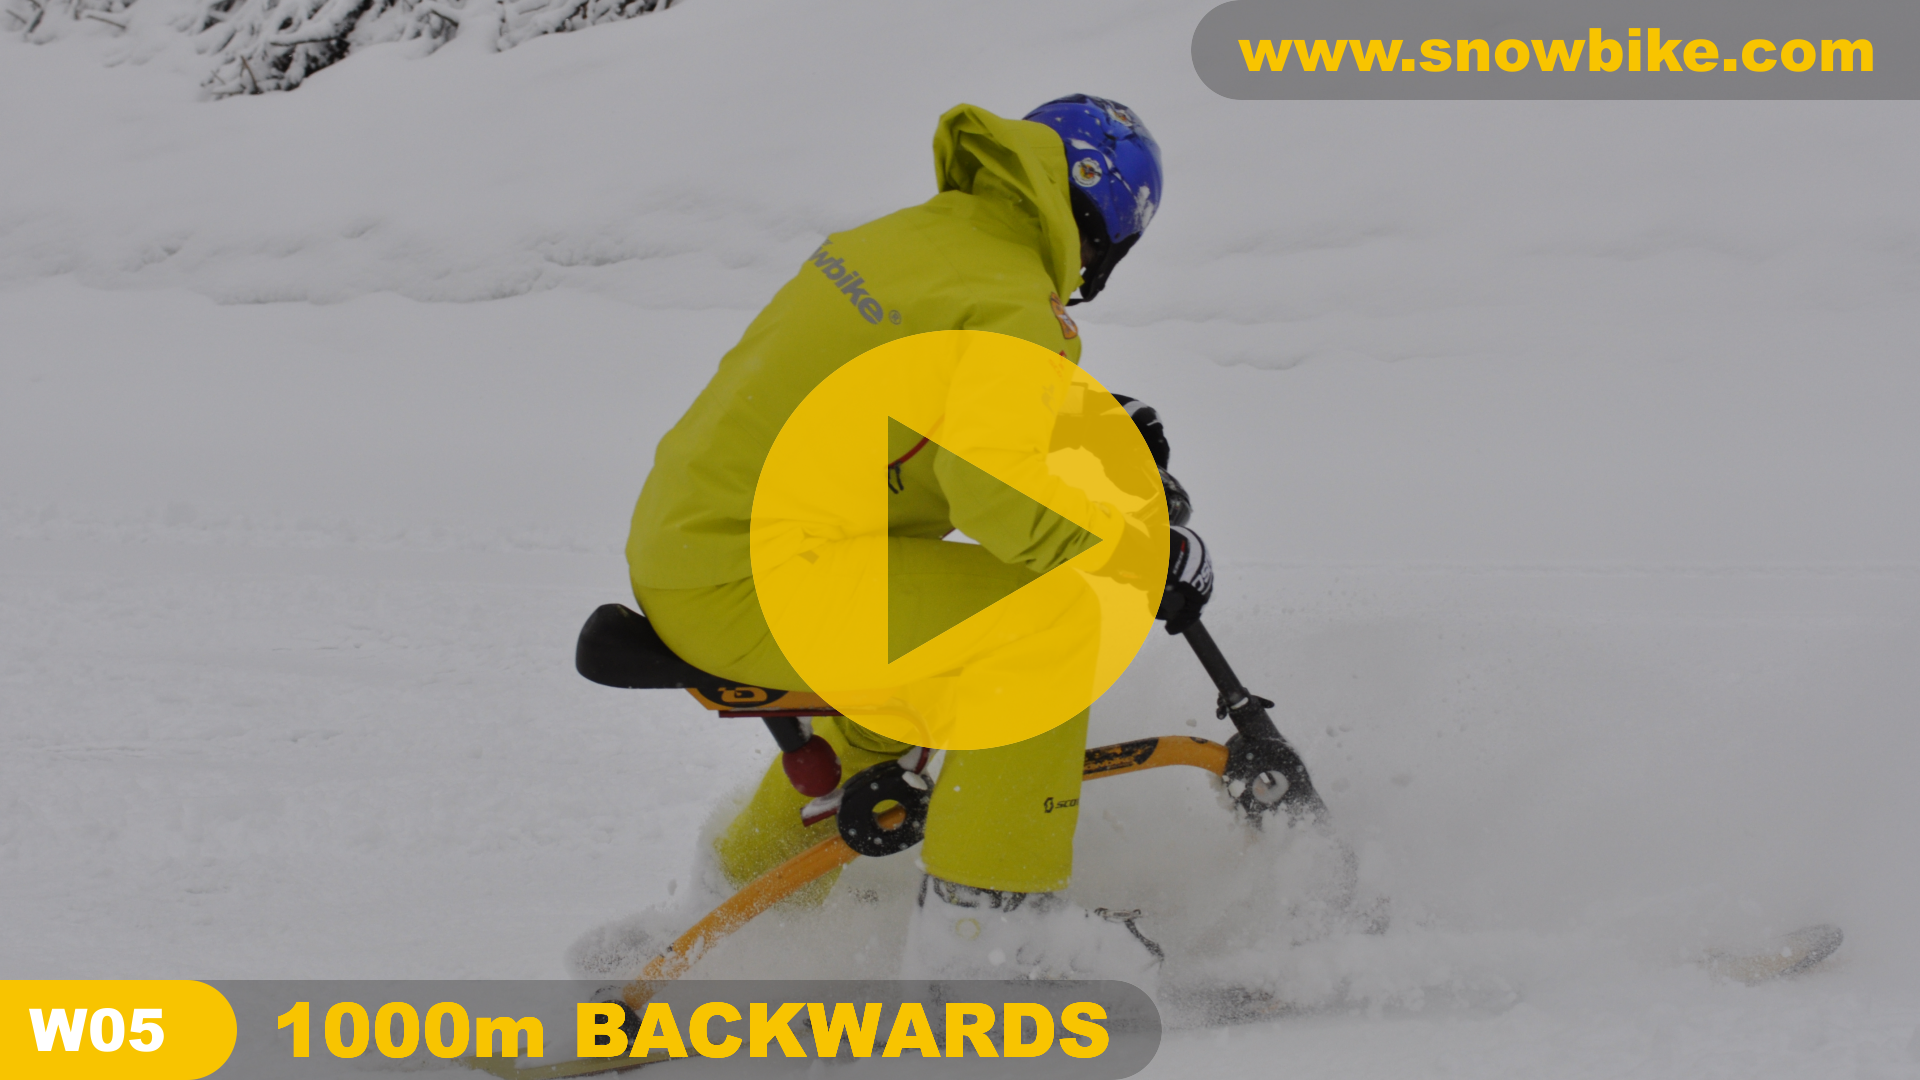 brenter-snowbike-world-record-1000m-backwards-coverC795DCA3-8650-7823-6D4C-816B09380045.png